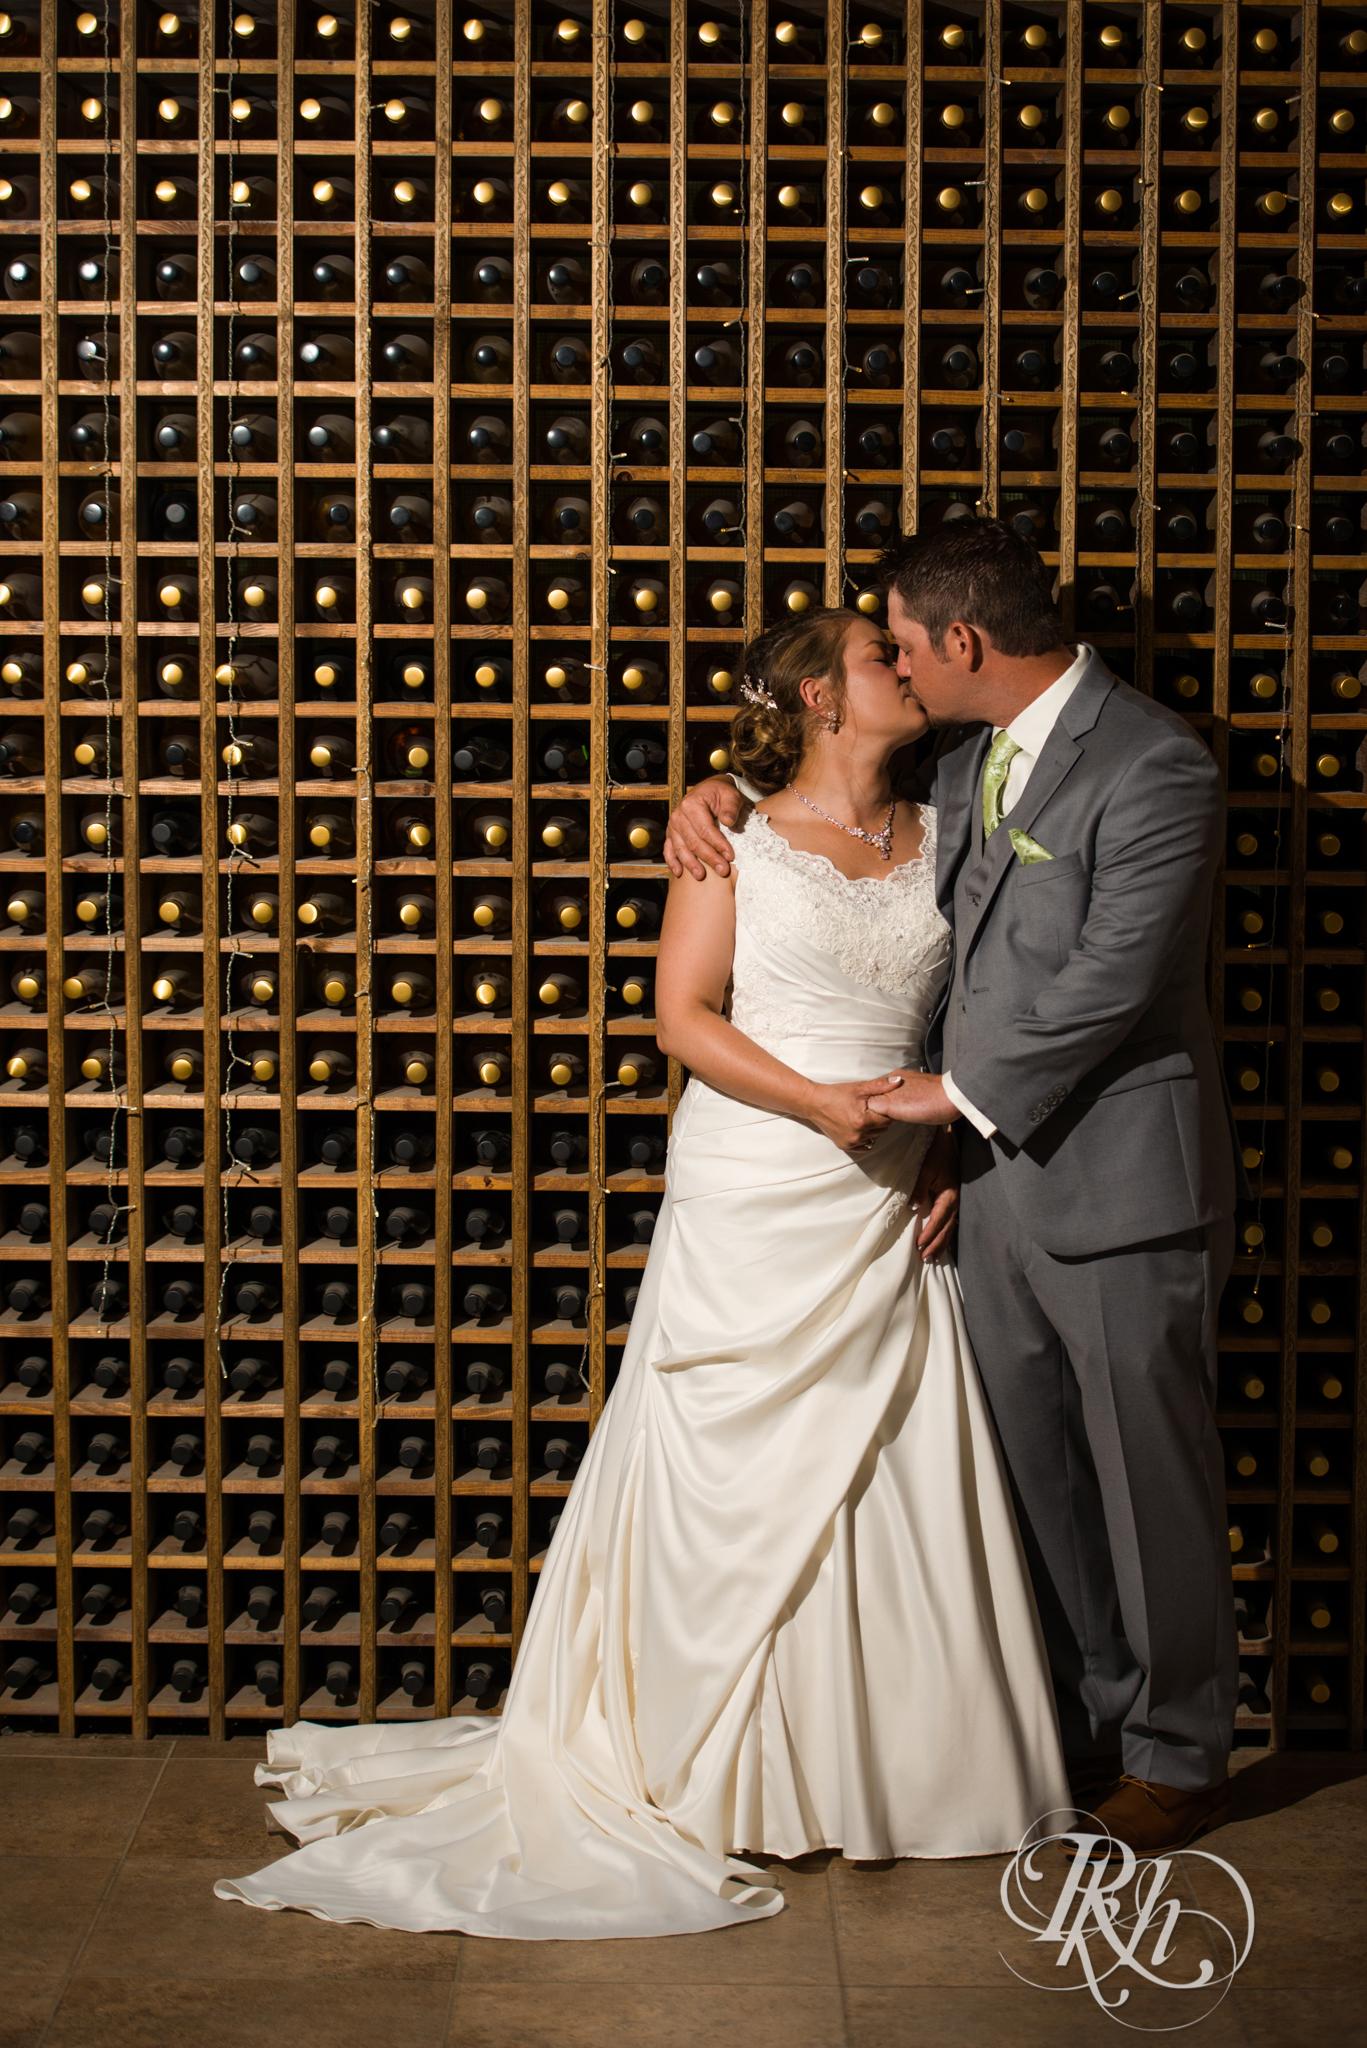 Ally & Nick - Minnesota Wedding Photography - Next Chapter Winery - RKH Images - Blog (30 of 57).jpg